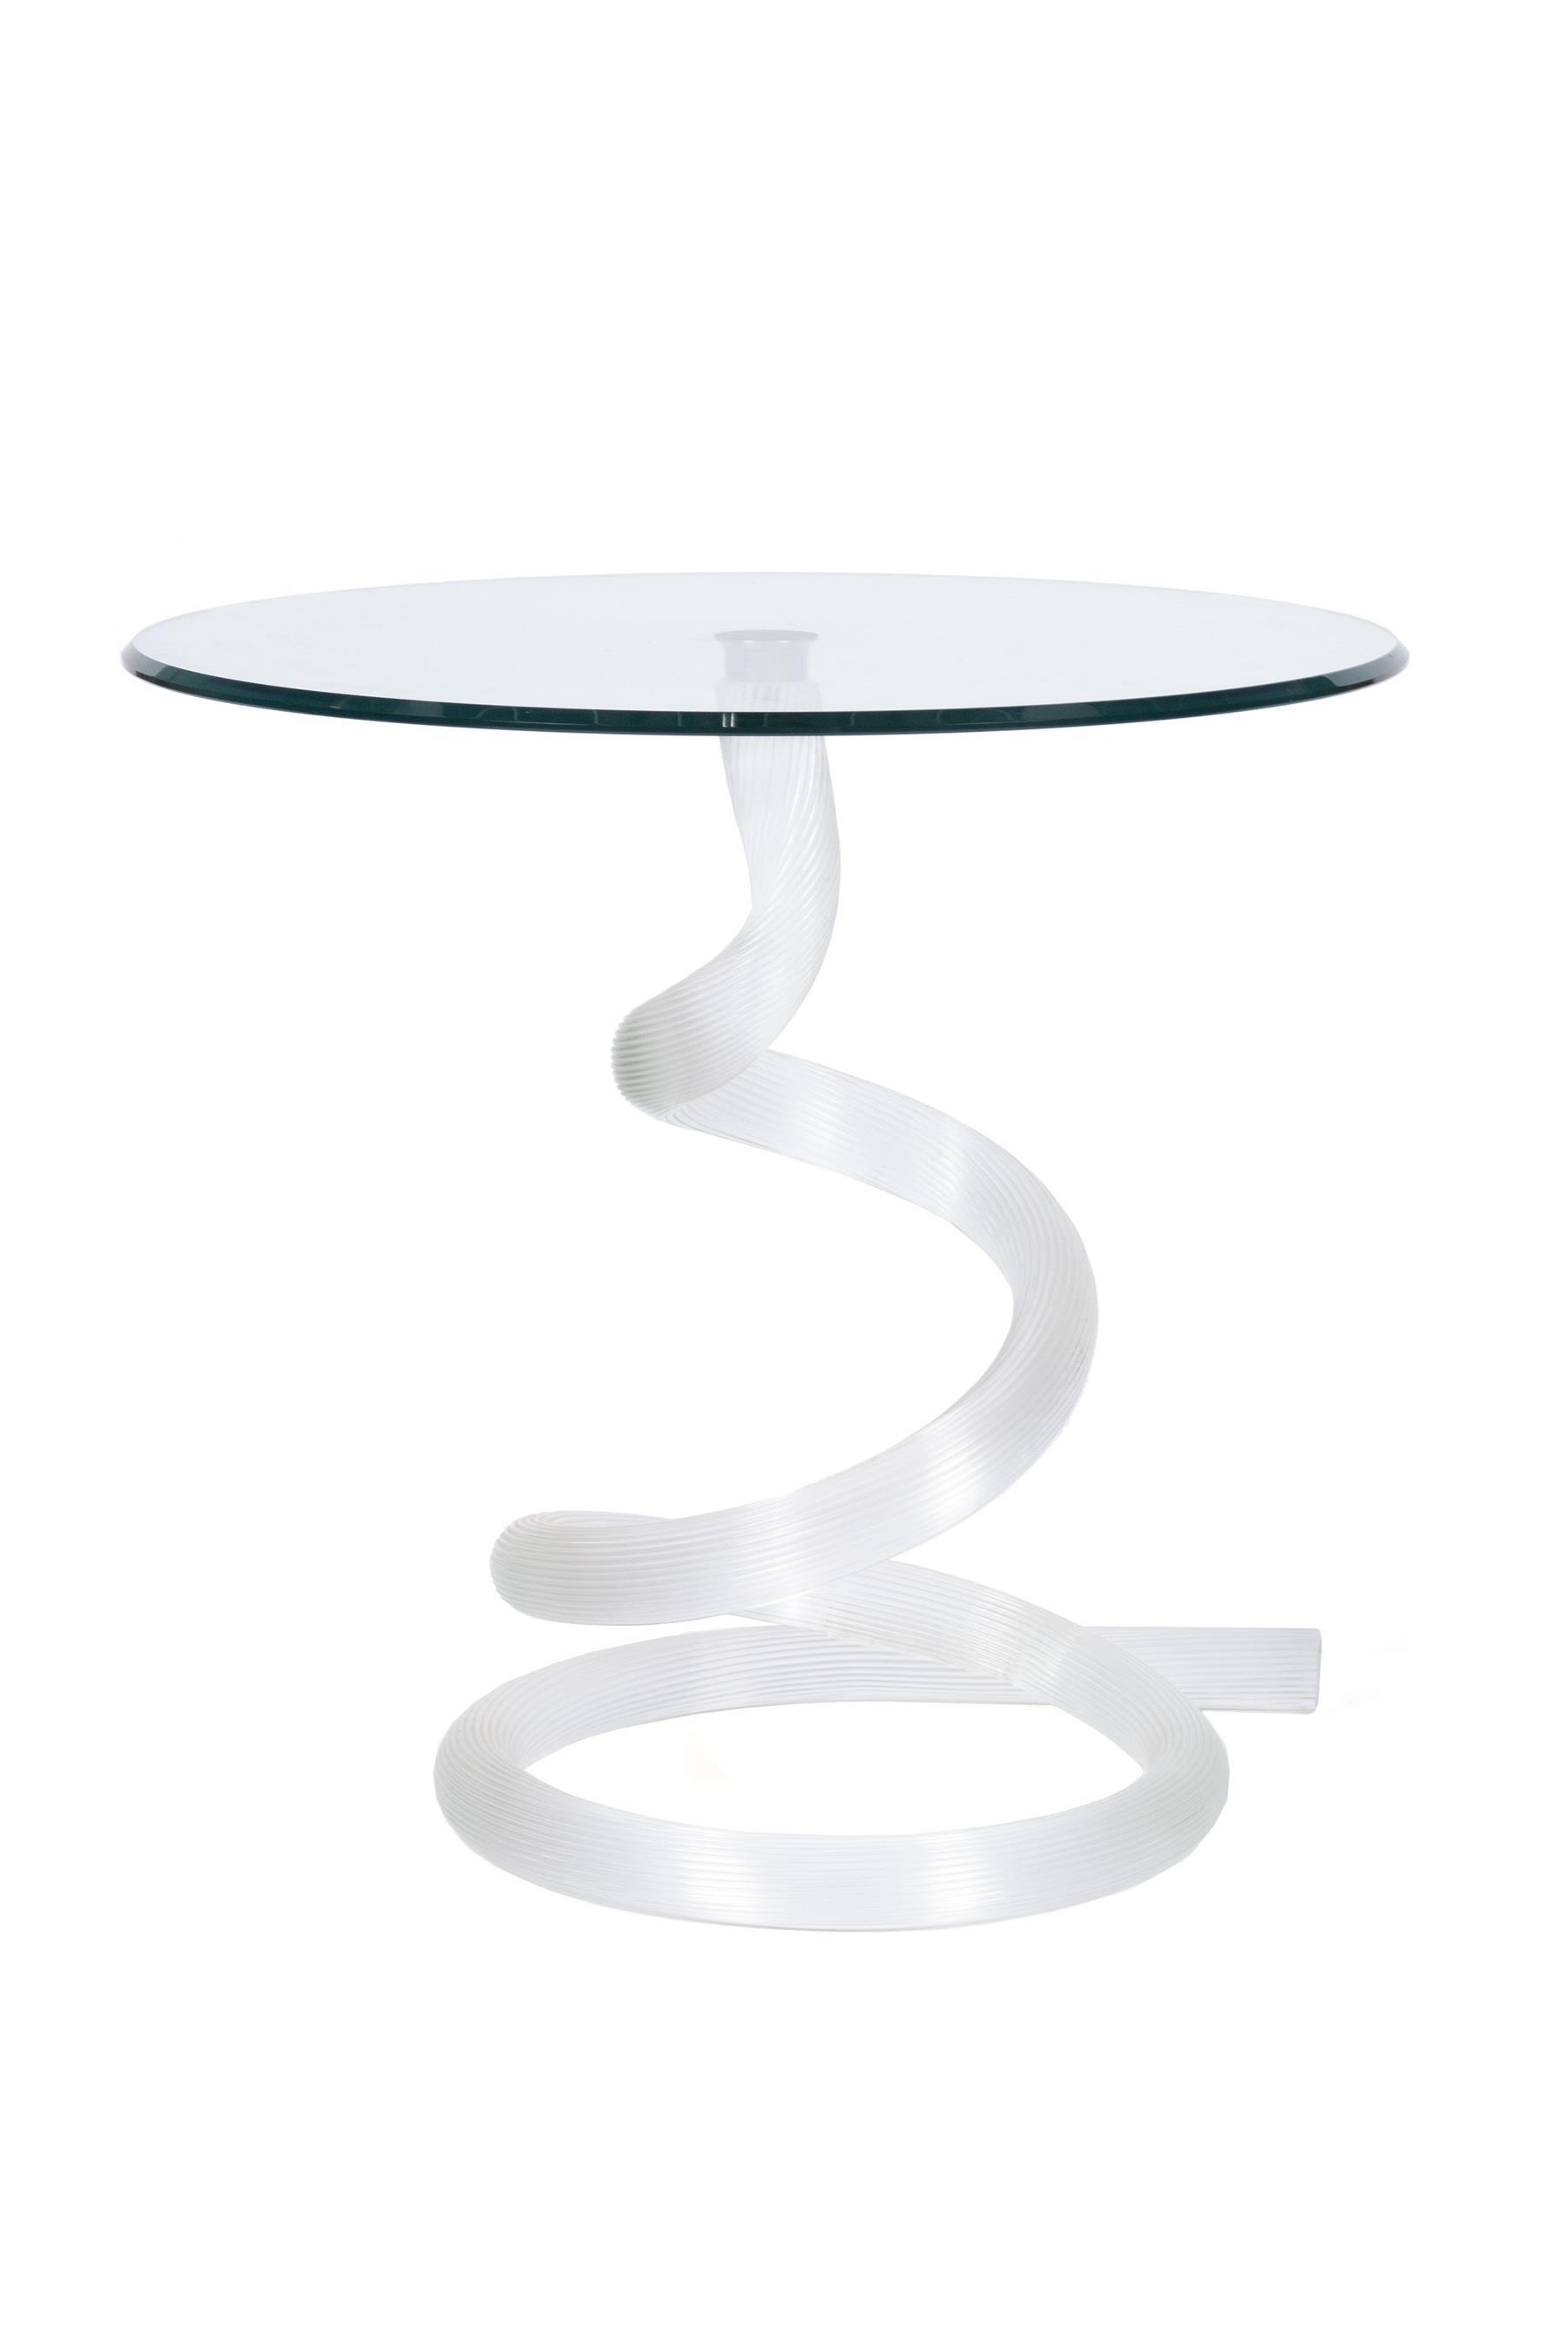 GHIBLI MURANO SIDE TABLE BY ROCHE BOBOIS